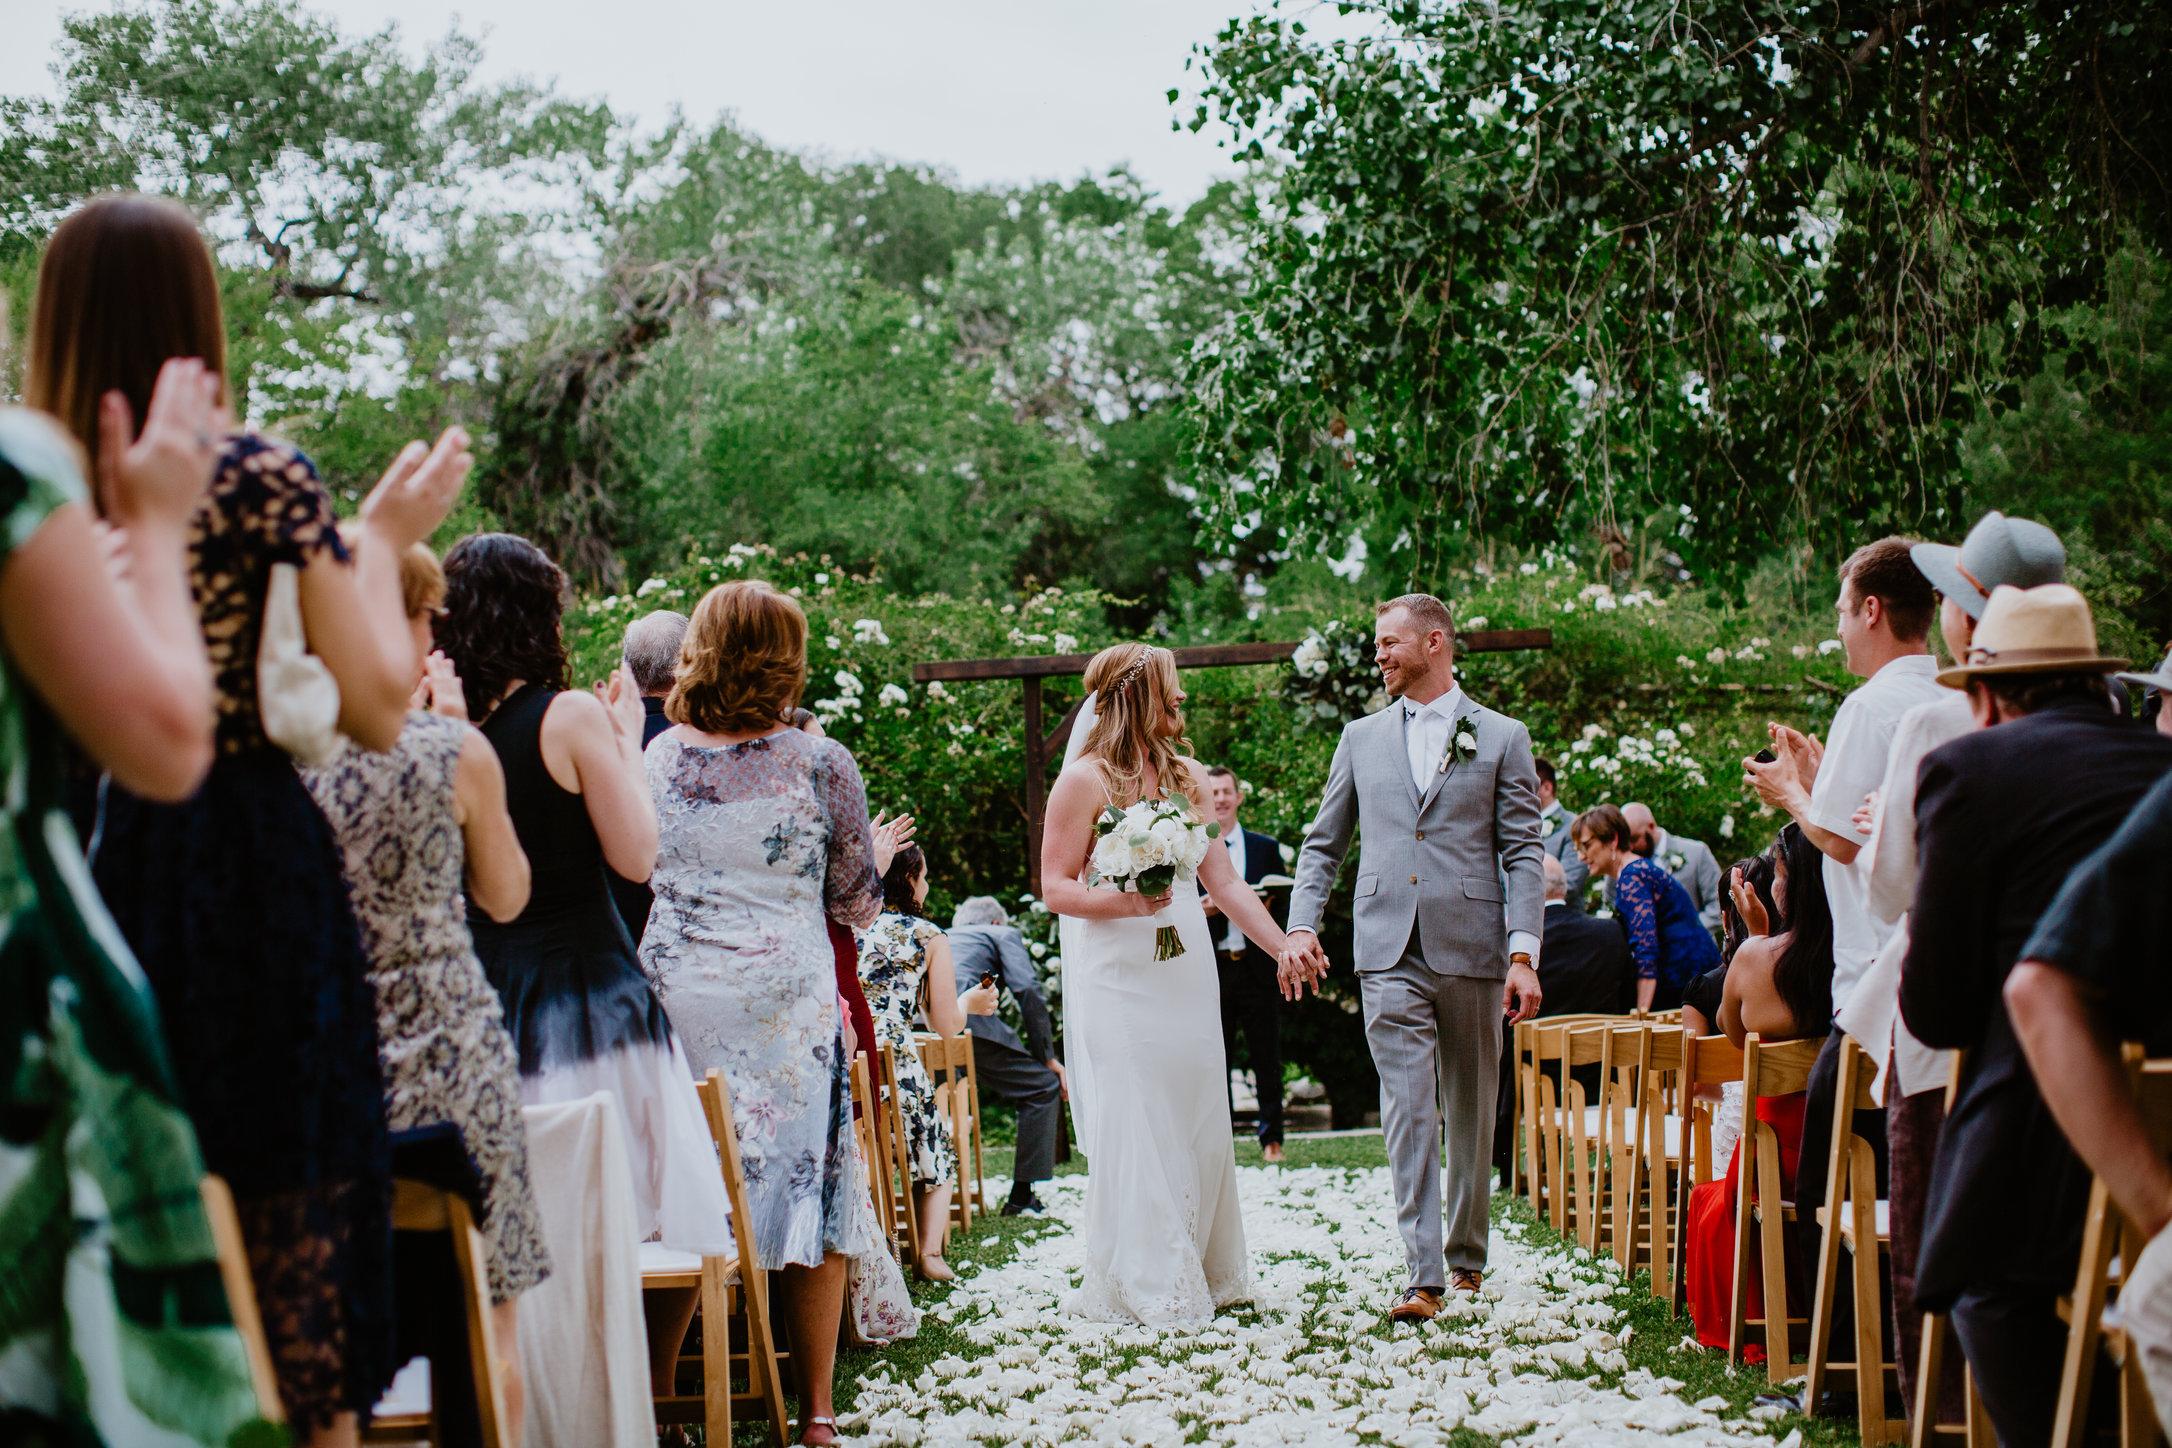 DandA-wedding-335.jpg